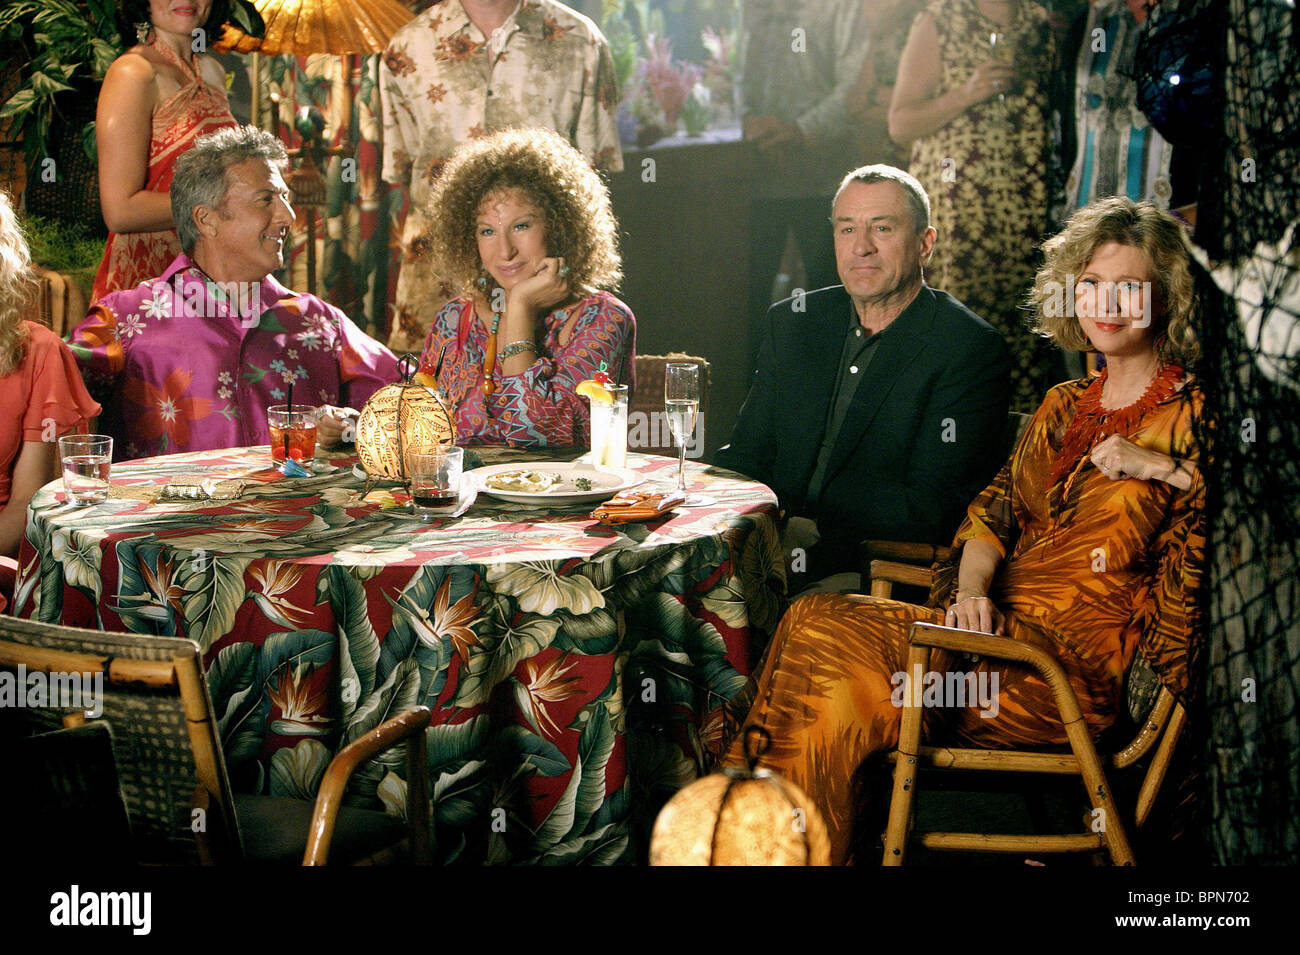 DUSTIN HOFFMAN BARBRA STREISAND ROBERT DE NIRO & BLYTHE ... Barbra Streisand Meet The Fockers